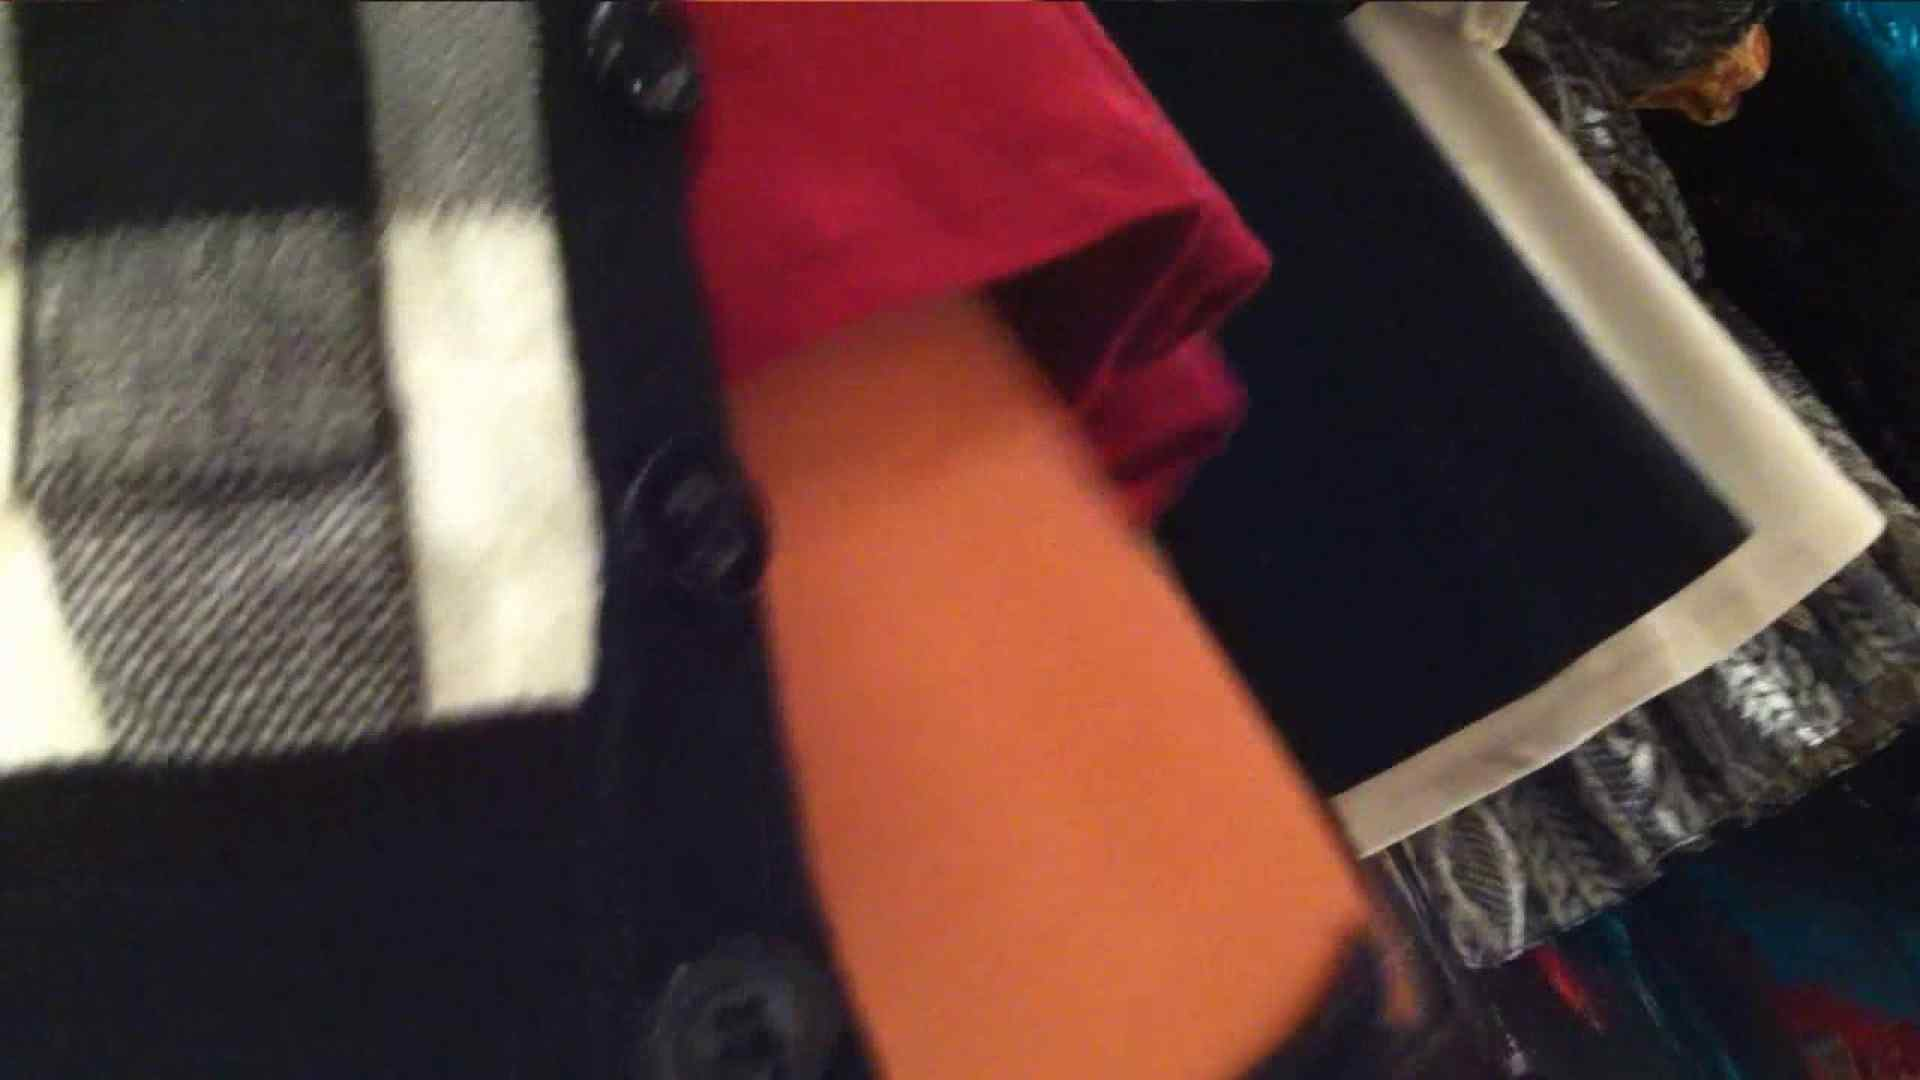 vol.33 美人アパレル胸チラ&パンチラ ギャル系ネーチャンの下着 下着姿 盗み撮り動画 94pic 27